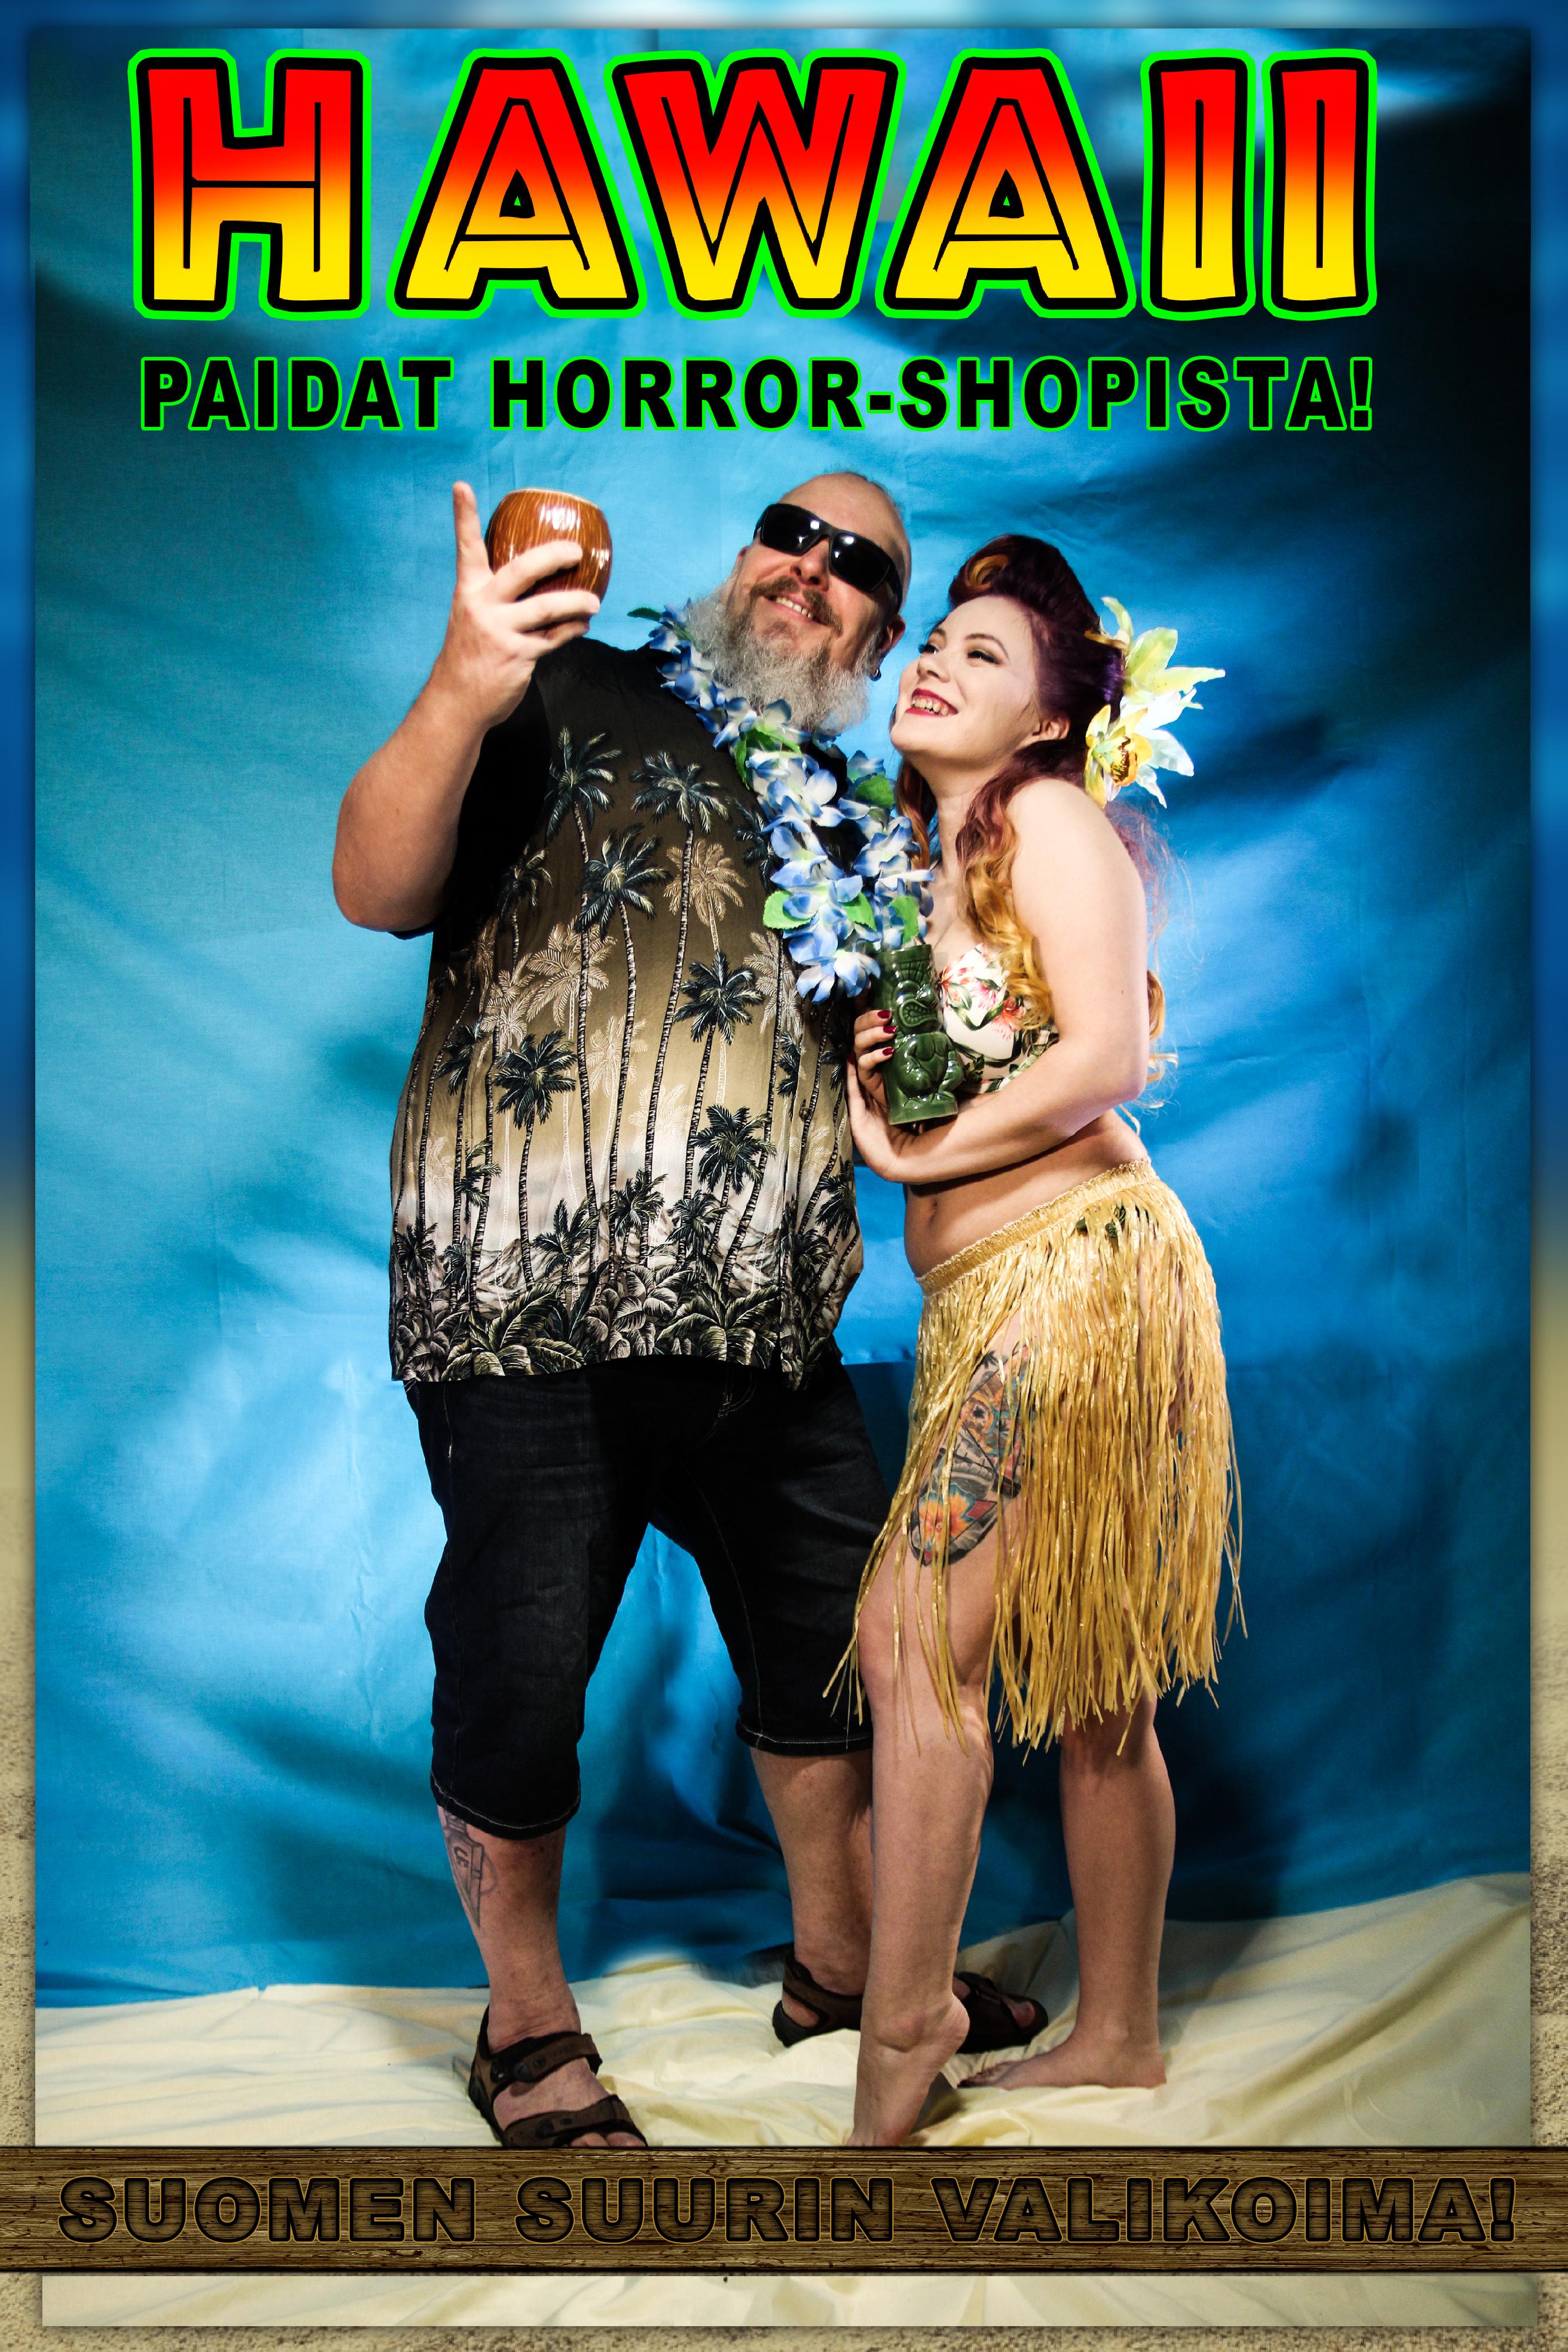 HAWAII paidat Horror-Shopista!